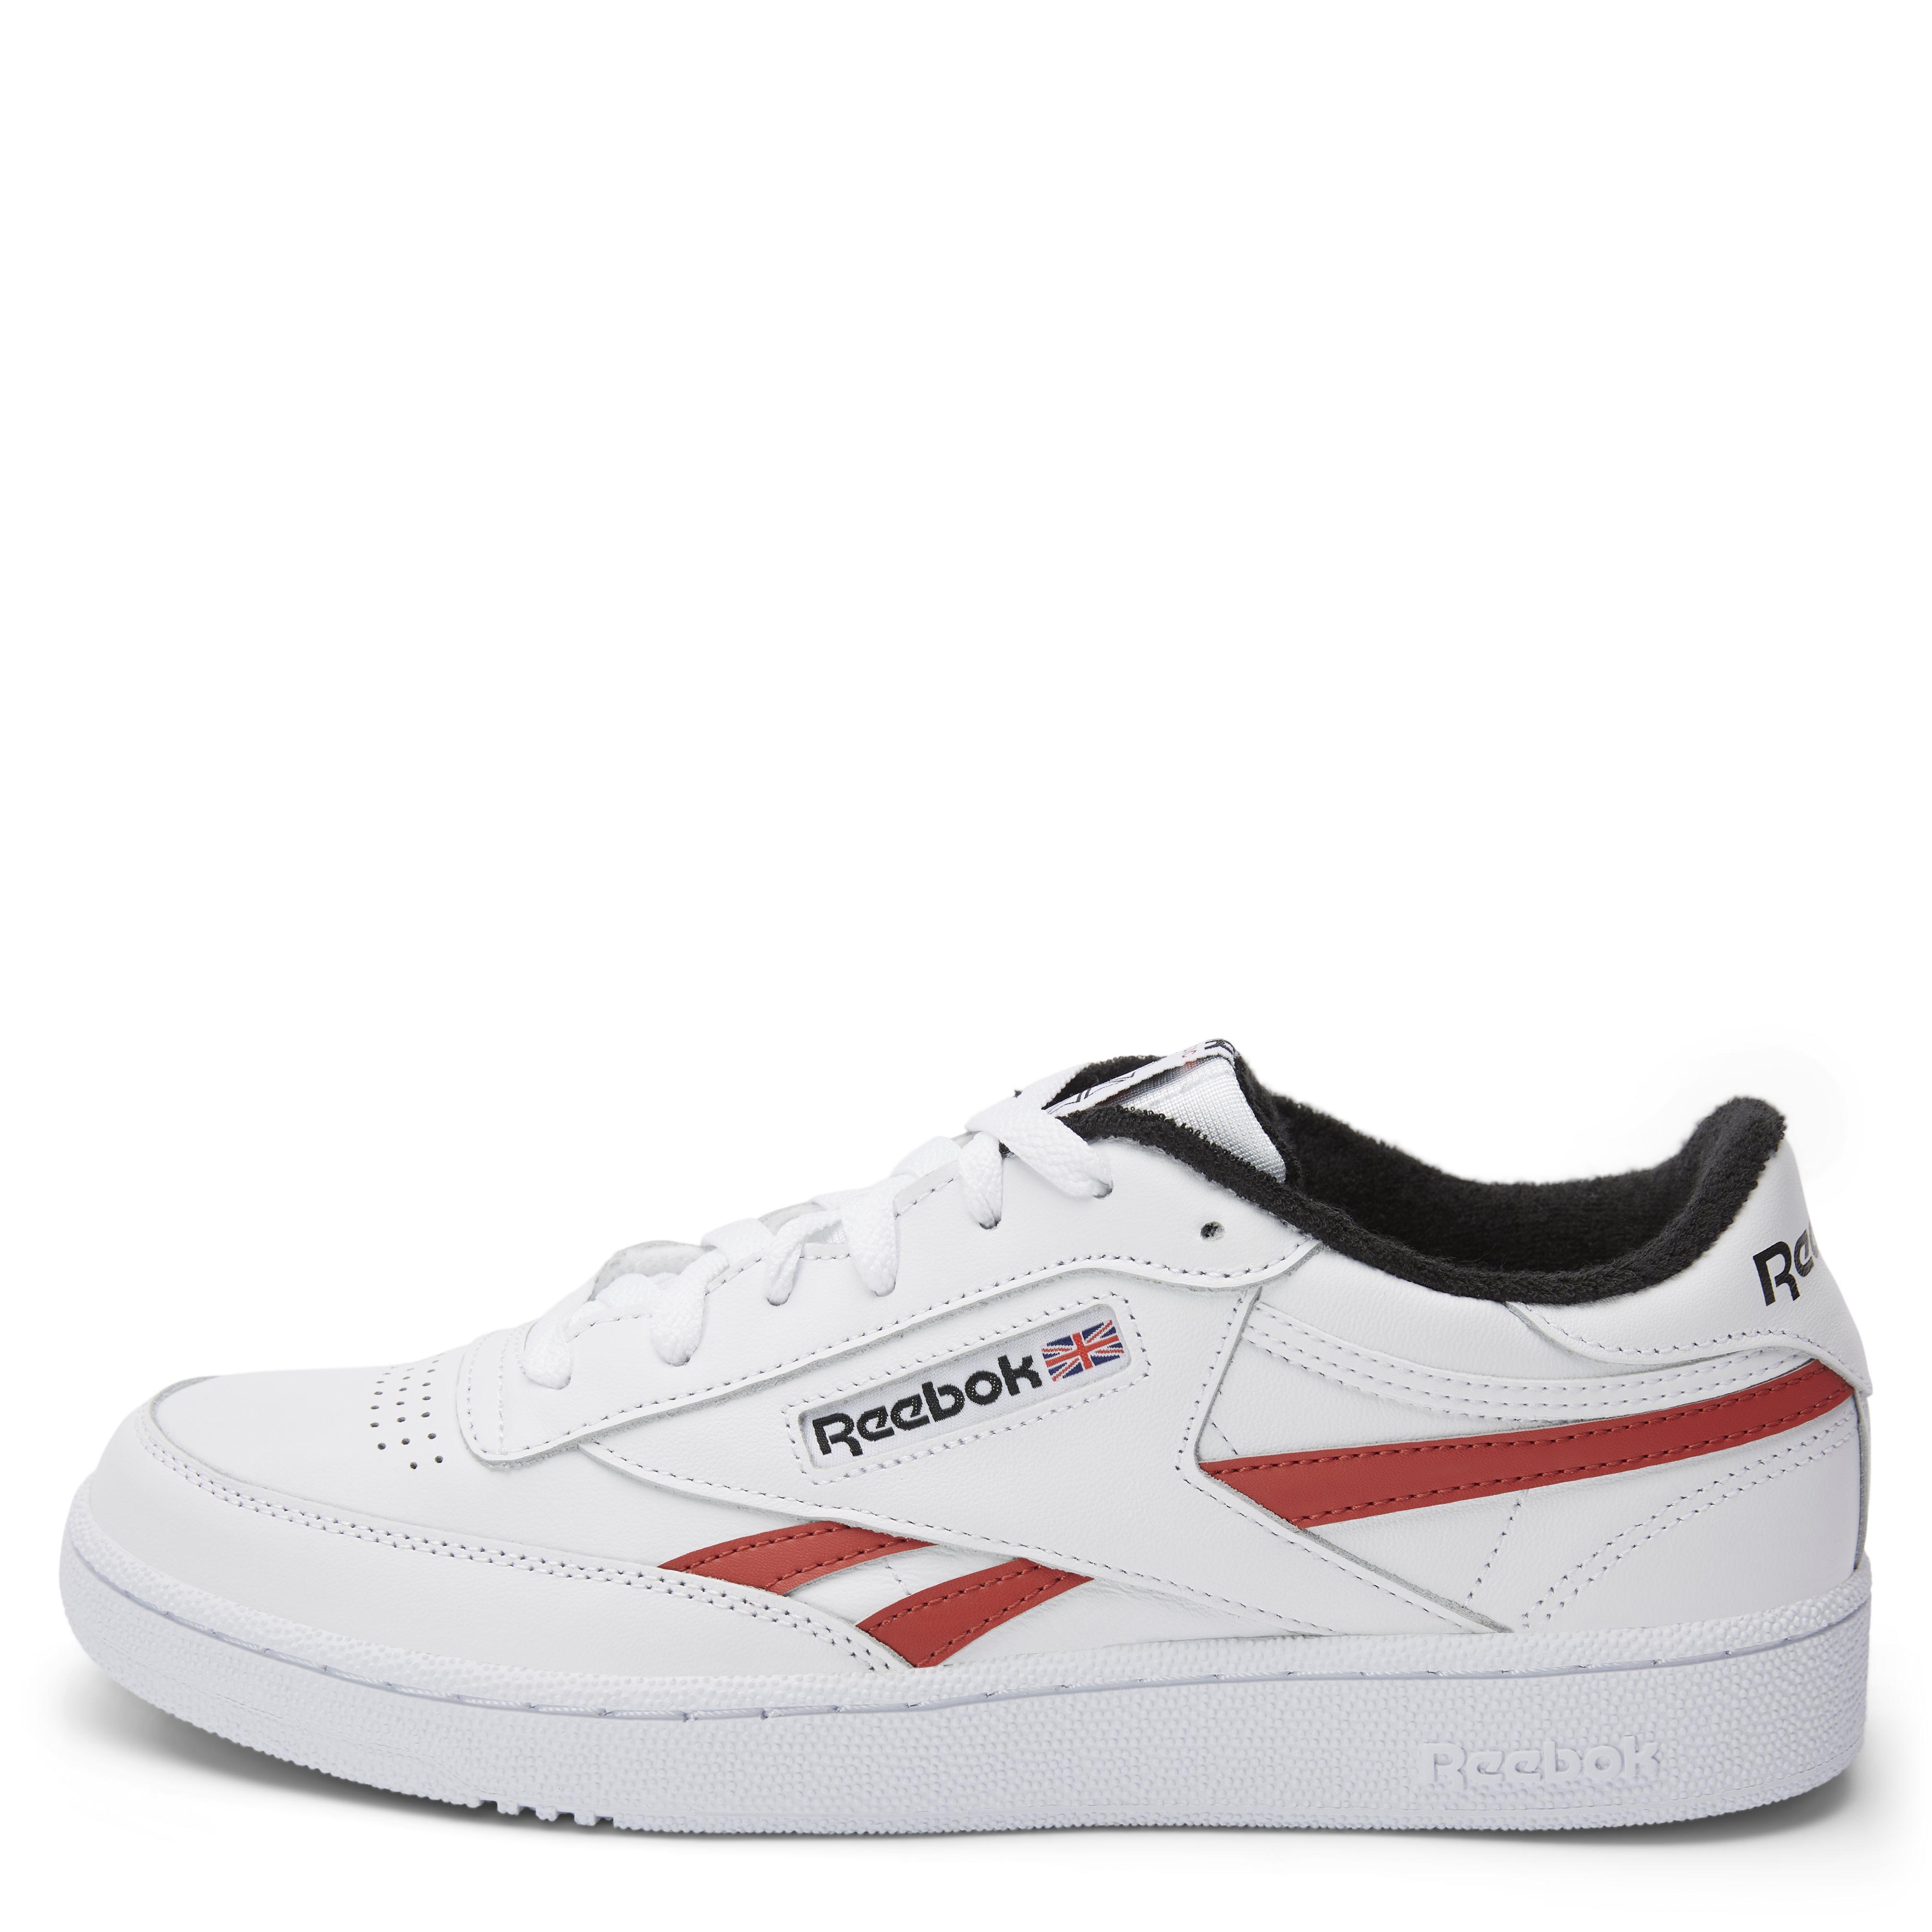 Club C Revenge Sneaker - Sko - Hvid